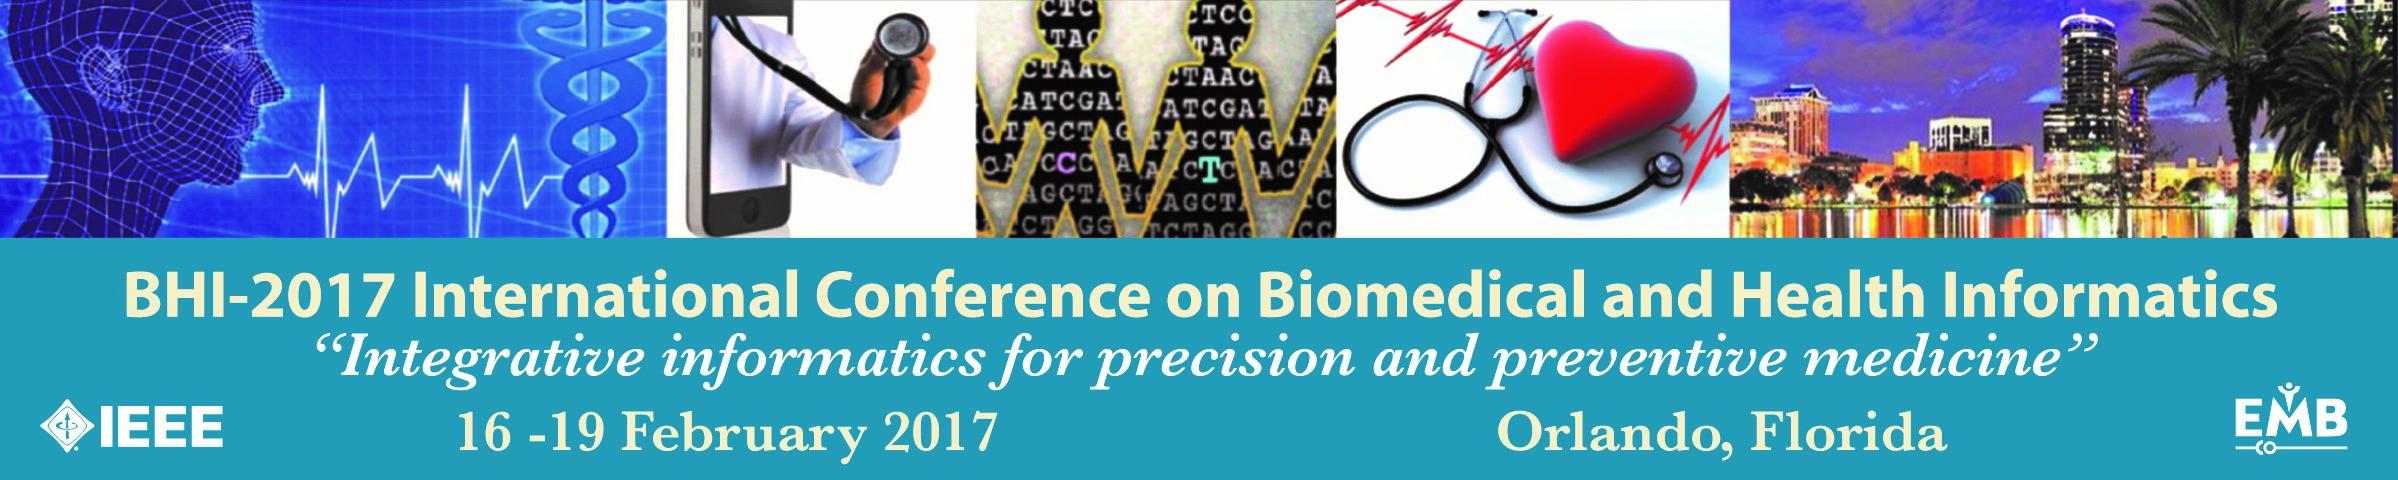 BHI - 2017 International Conference on Biomedical and Health Informatics